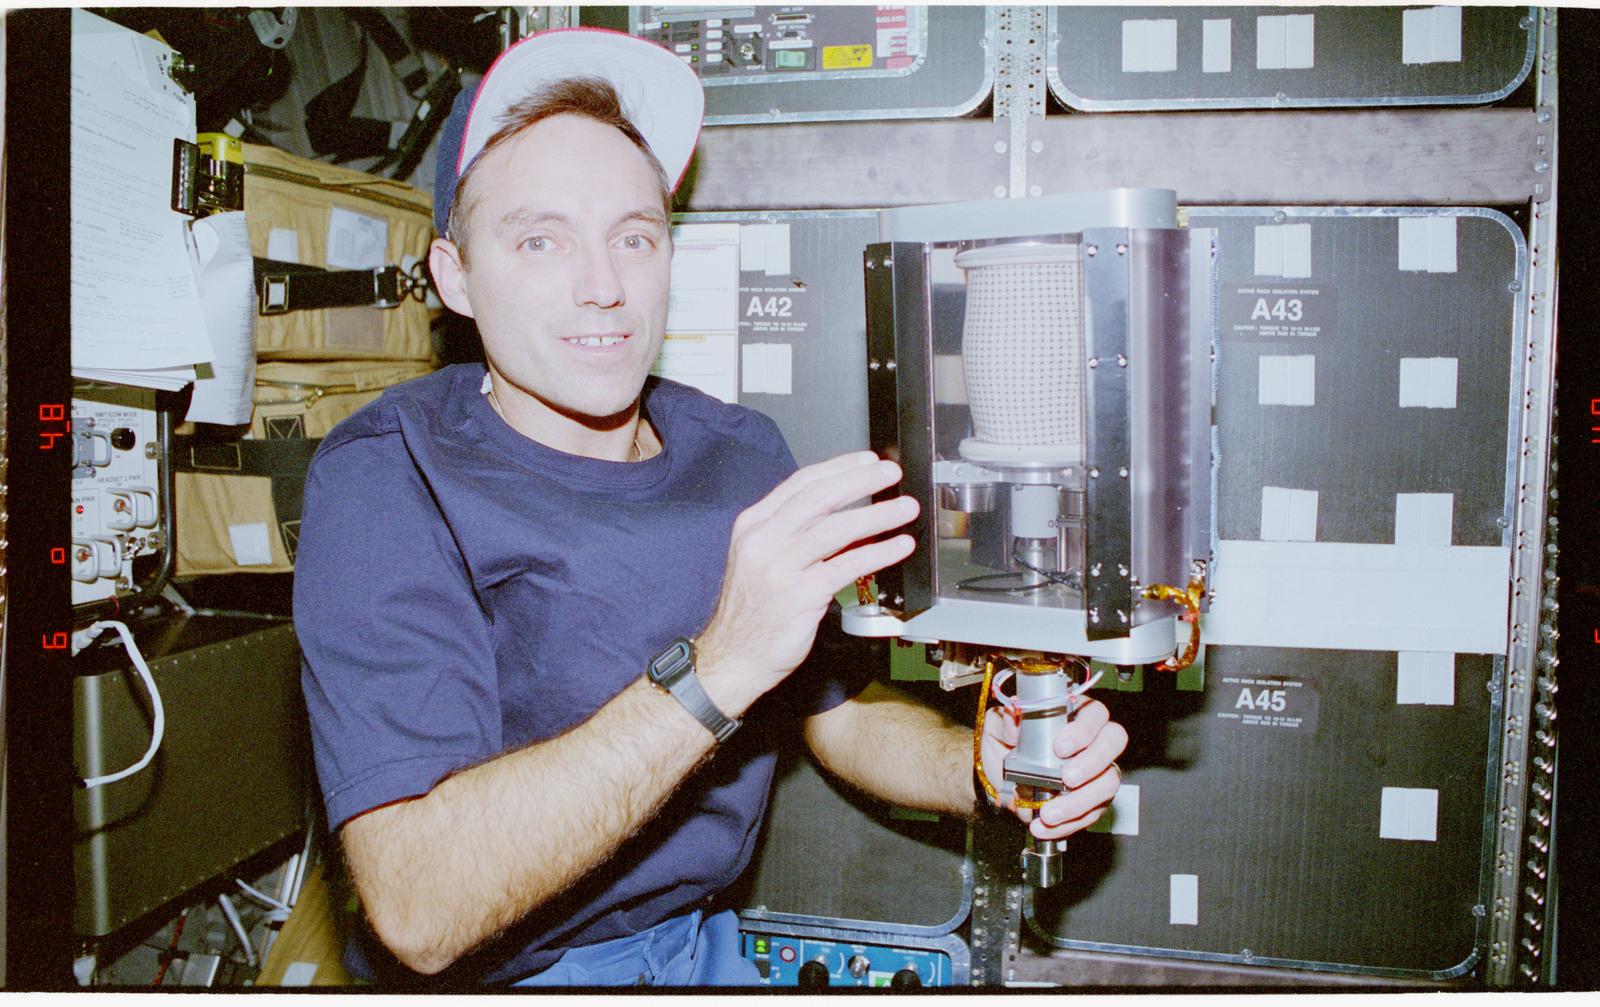 STS079-304-013 - STS-079 - MGM - Mechanics of Granular Materials sample